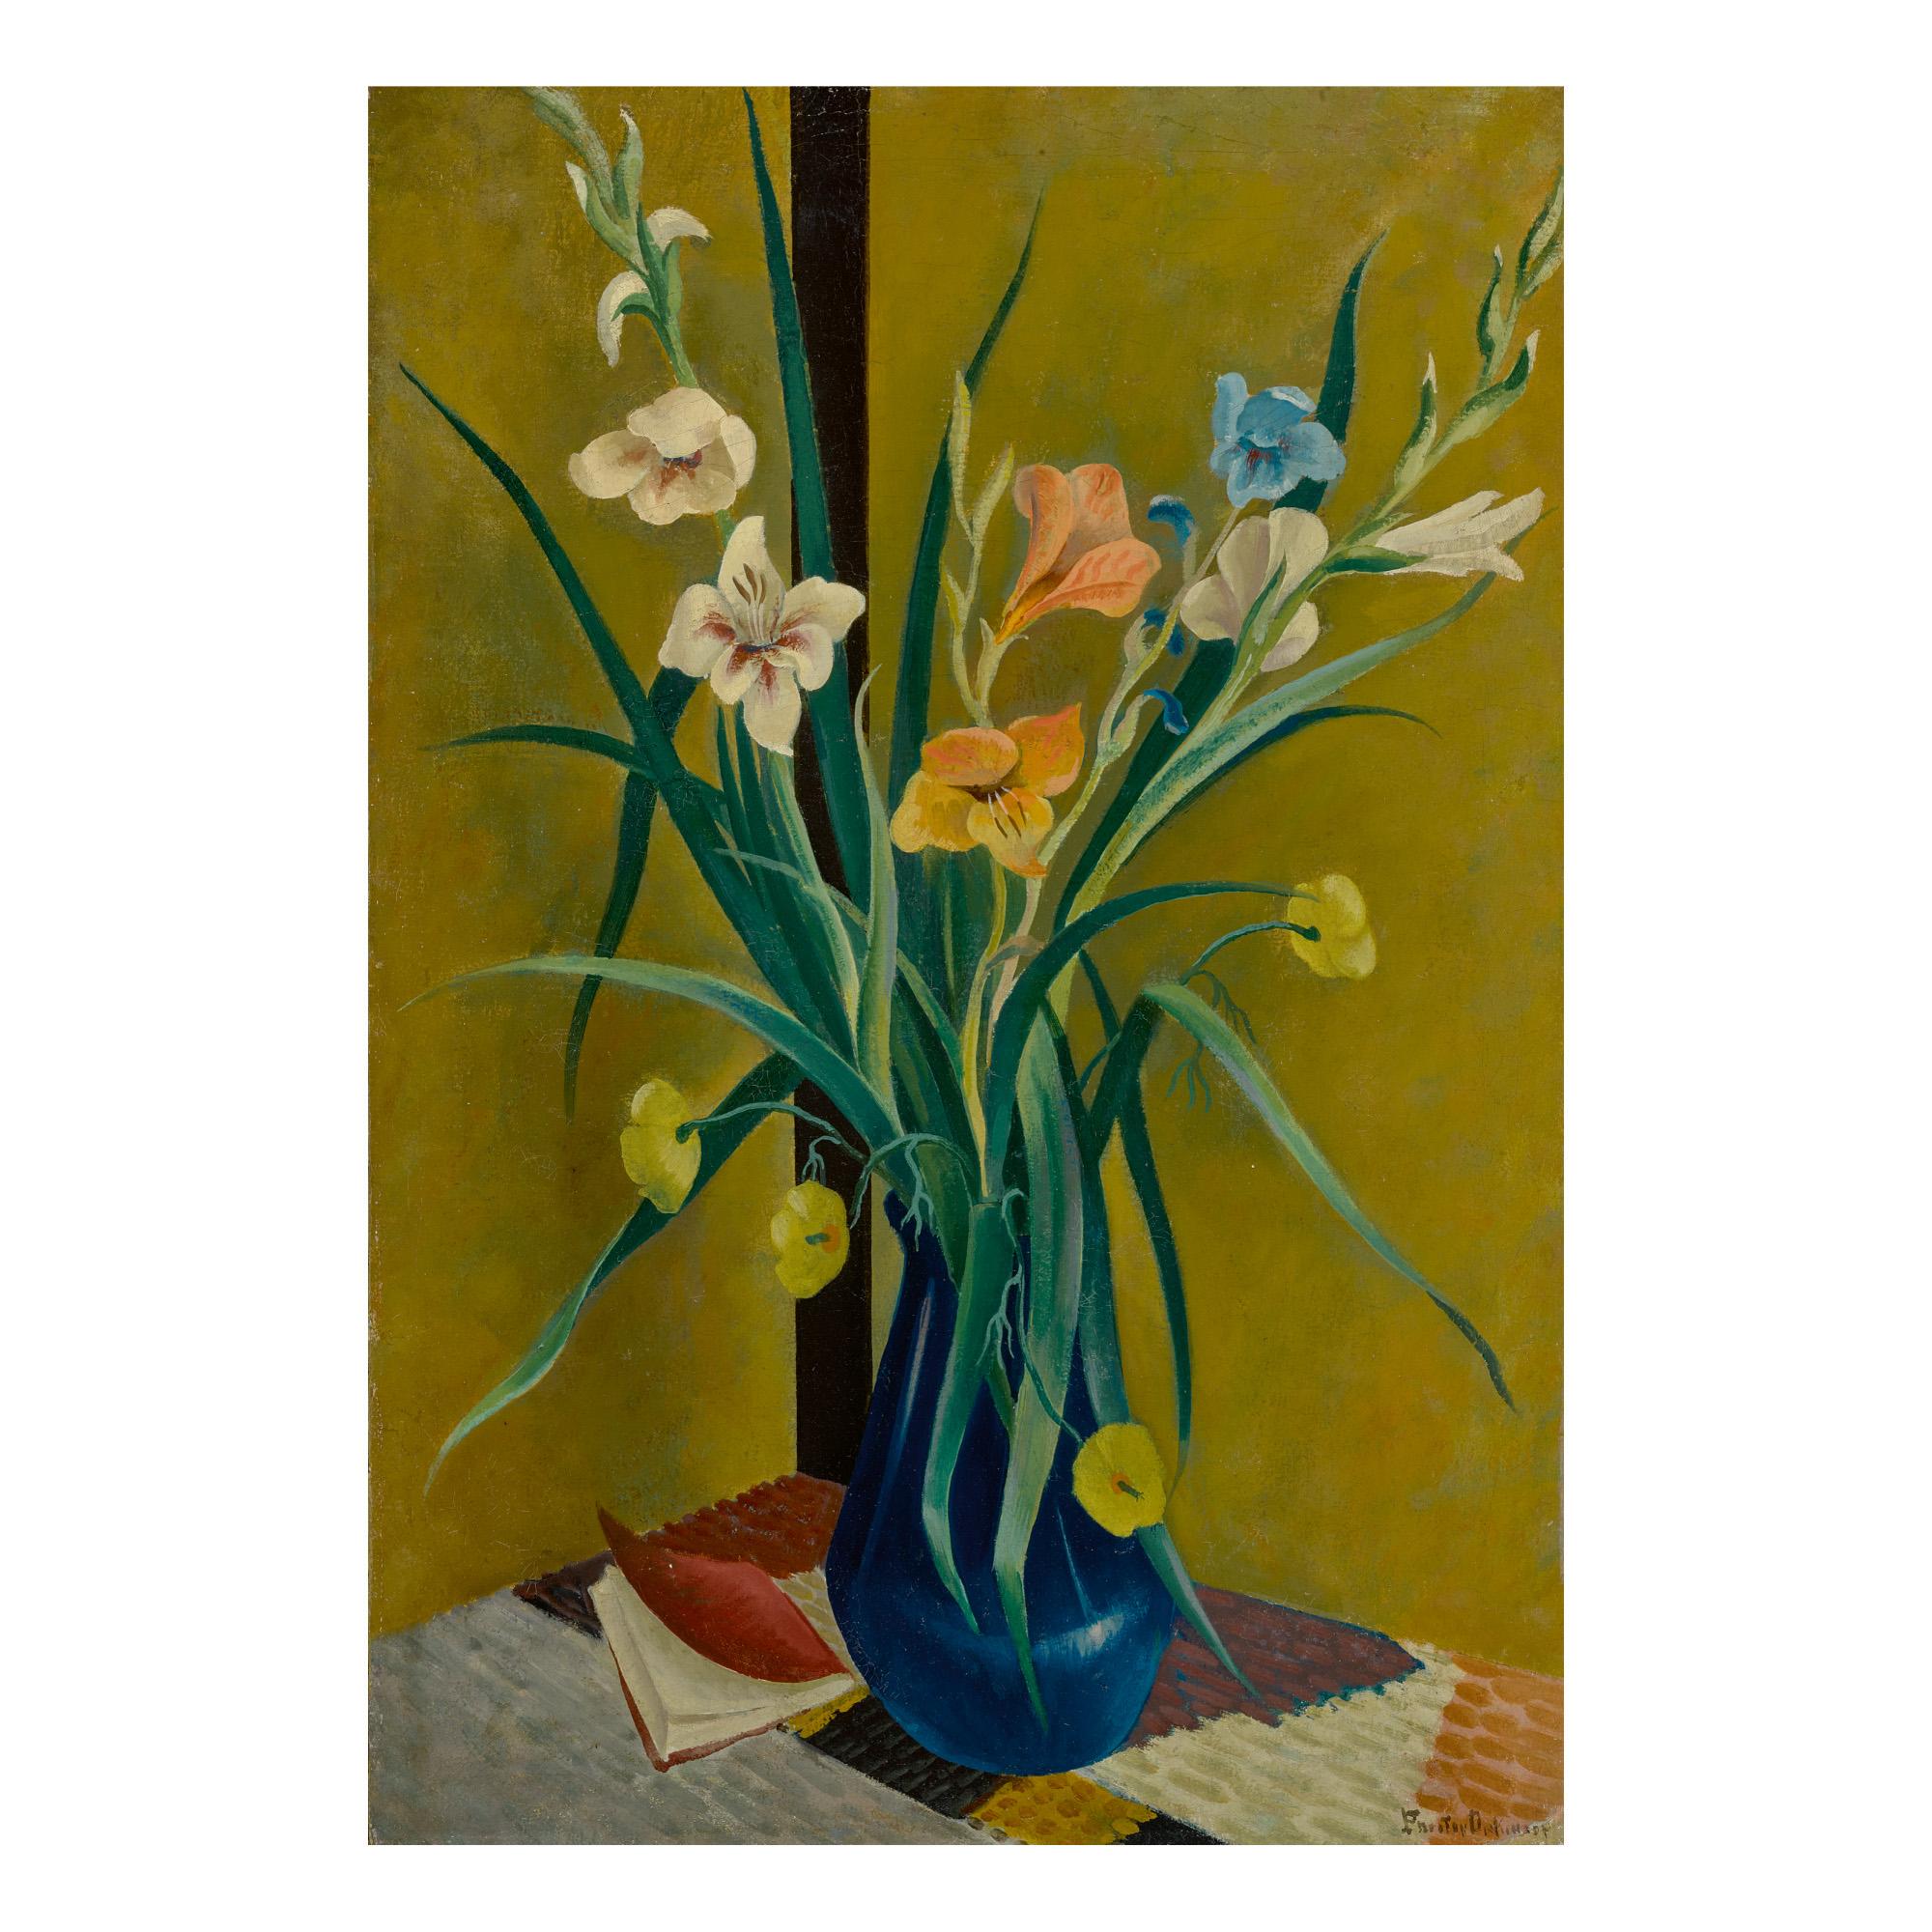 PRESTON DICKINSON | FLOWERS IN VASE